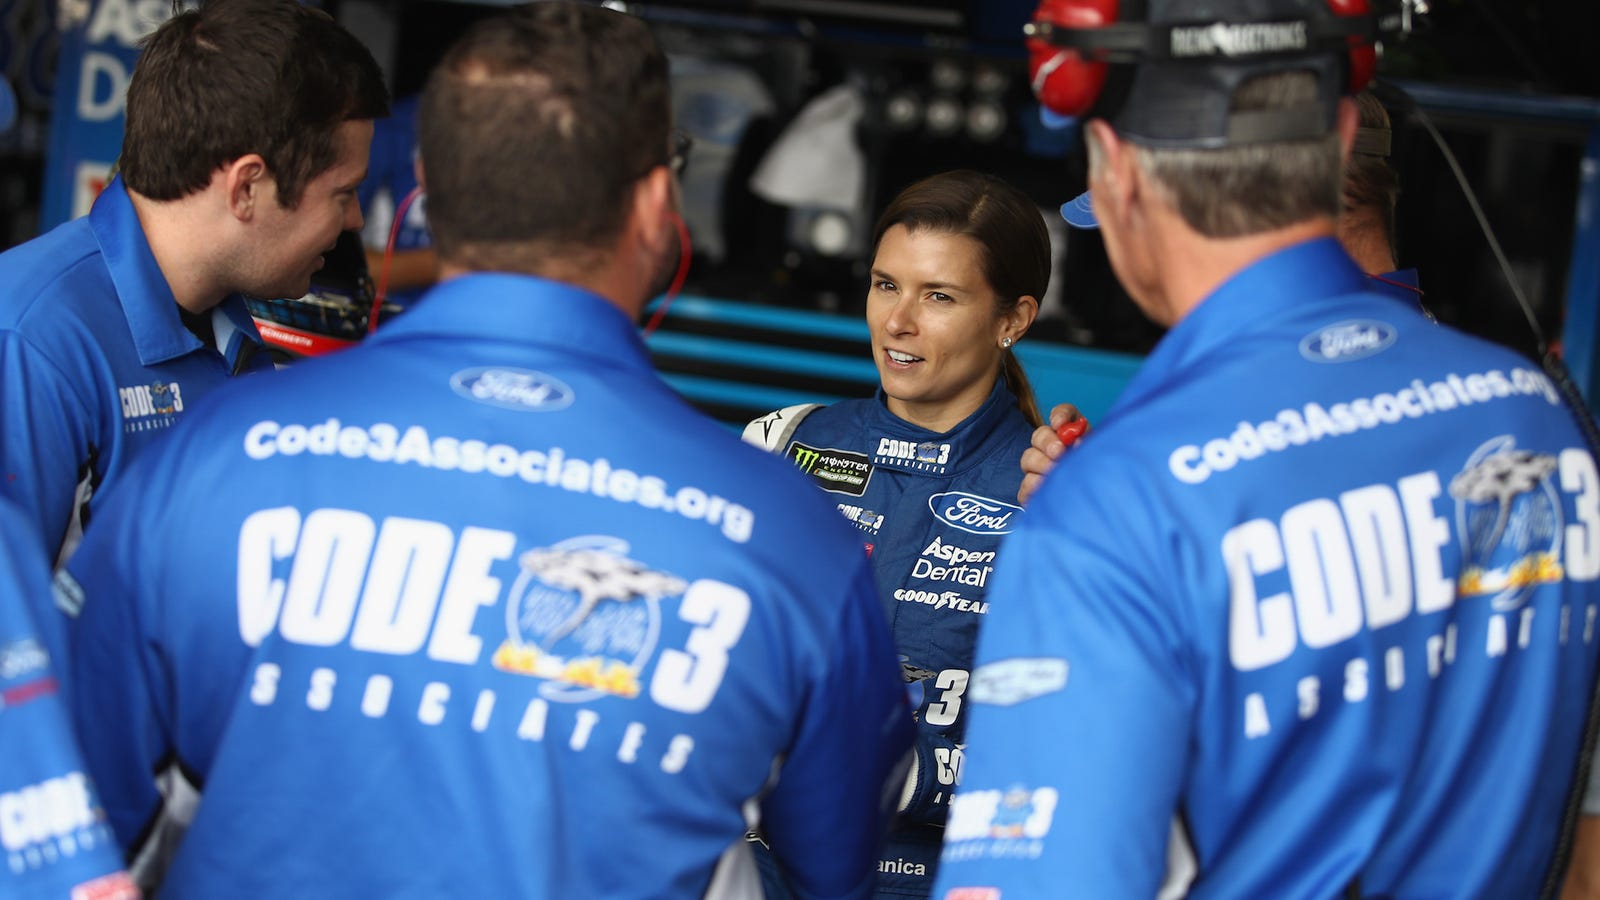 Danica Patrick Loses NASCAR Ride